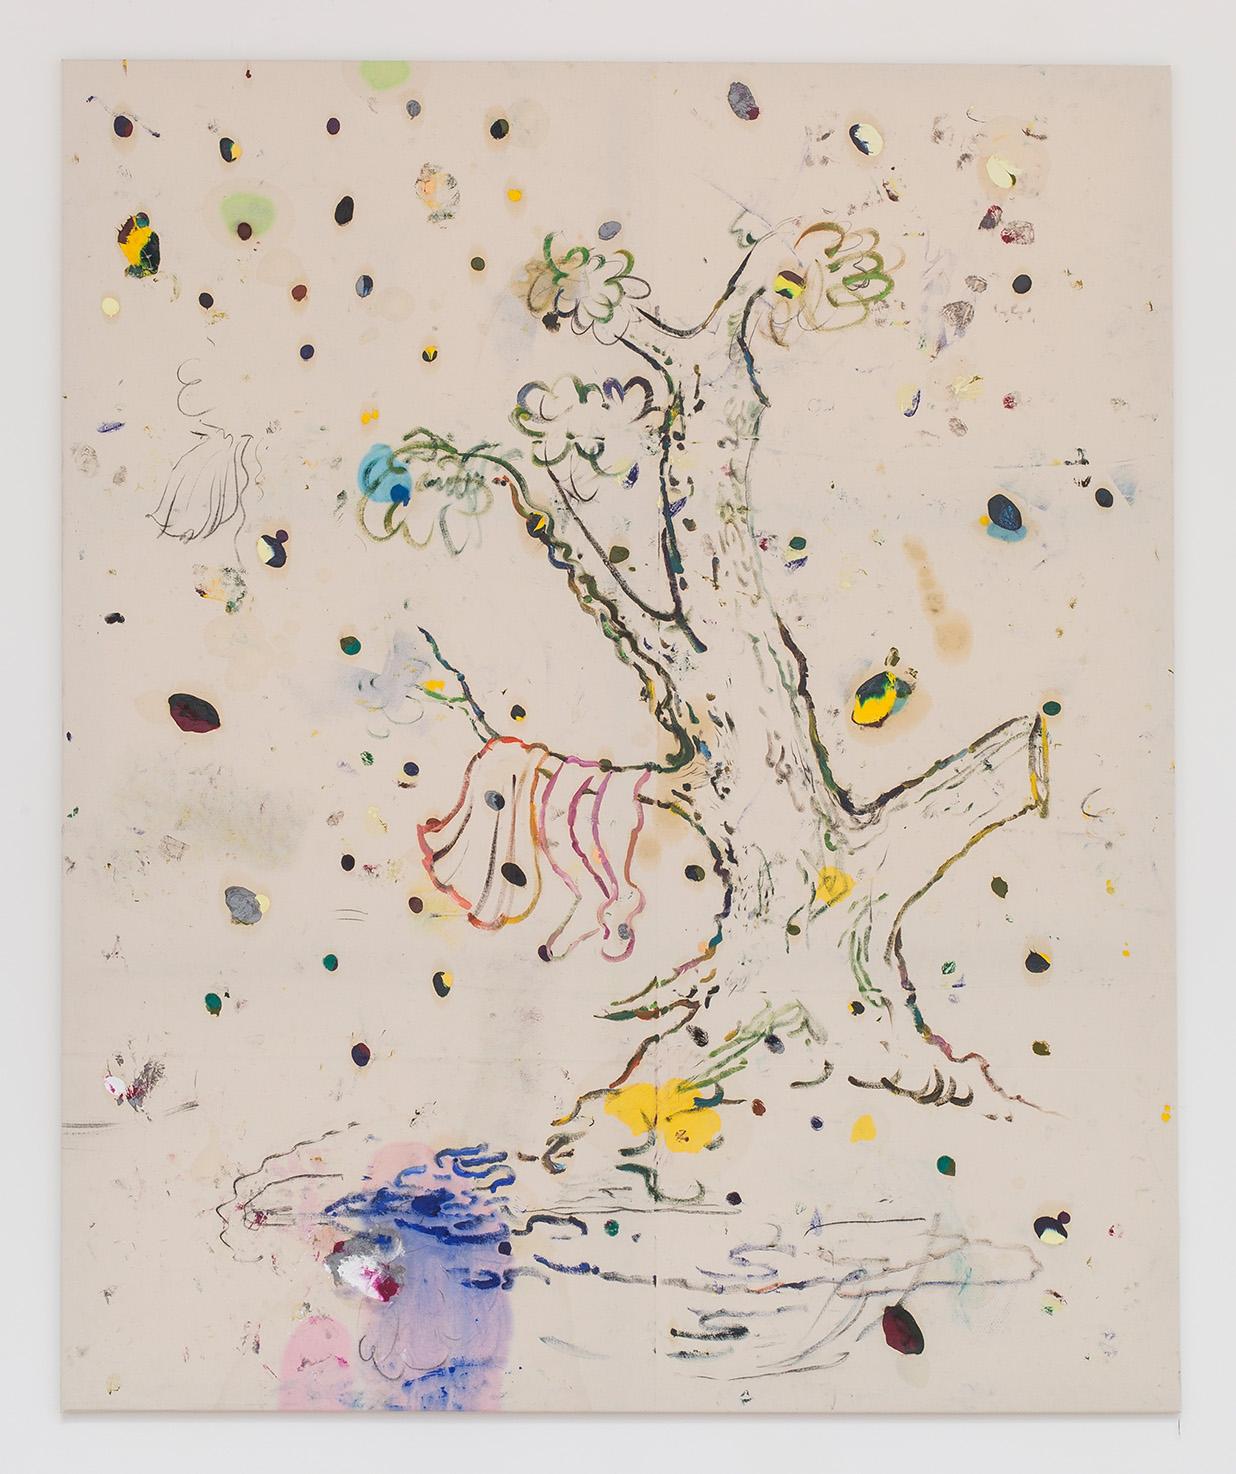 Razvan Boar, Juice Tree, oil, charcoal and spray paint on canvas, 217x180 cm, 2015, courtesy Ibid Gallery and razvan Boar